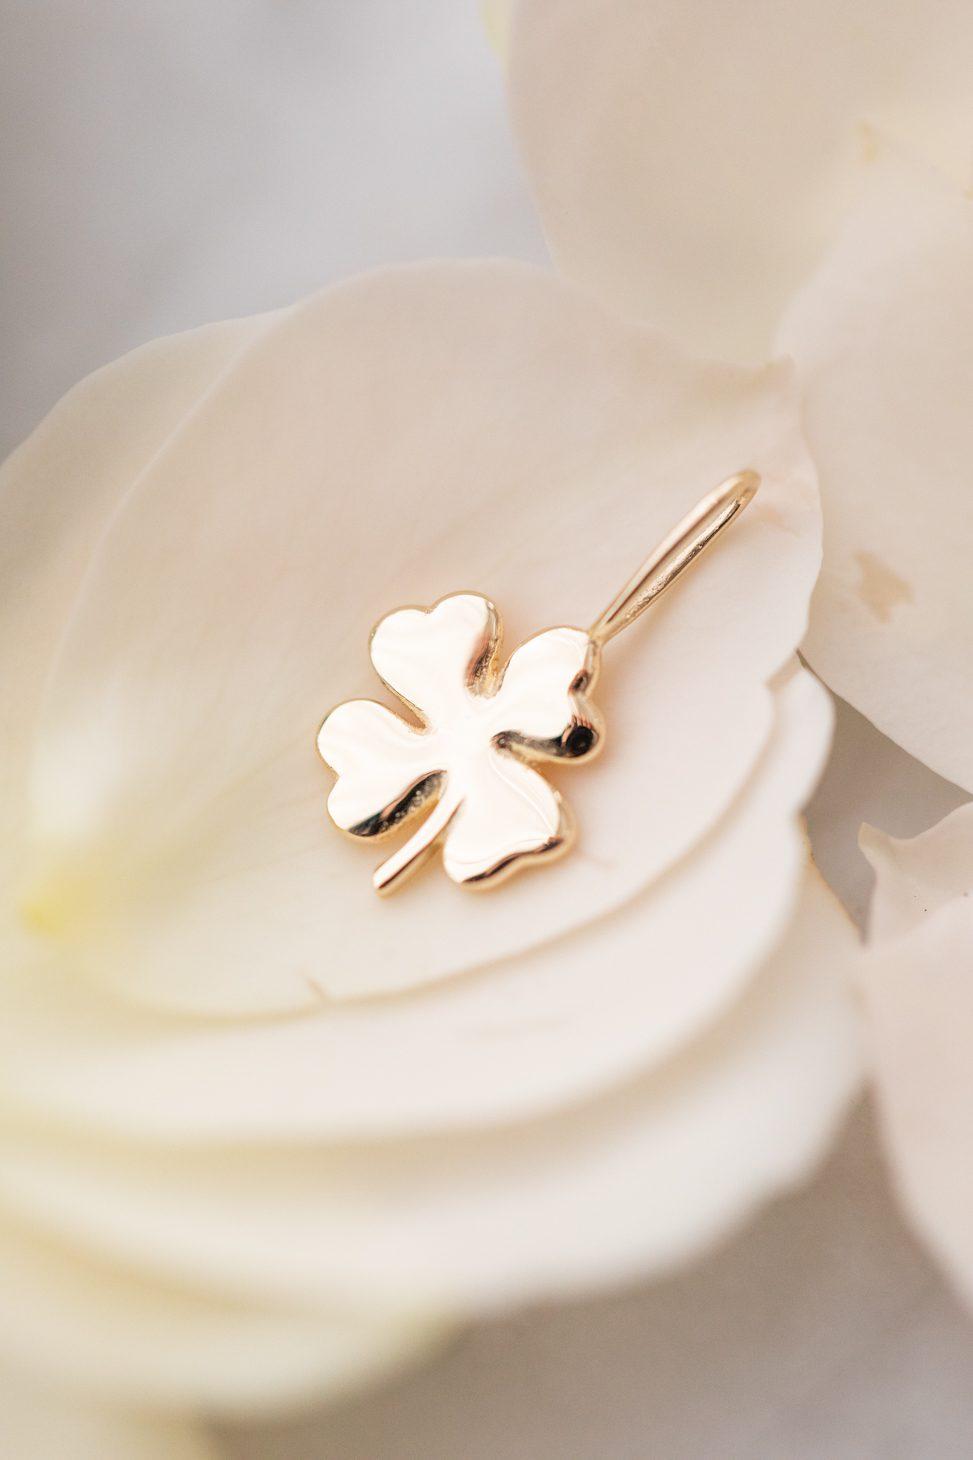 The Four Leaf Clover Charm, Melanie Auld Jewelry